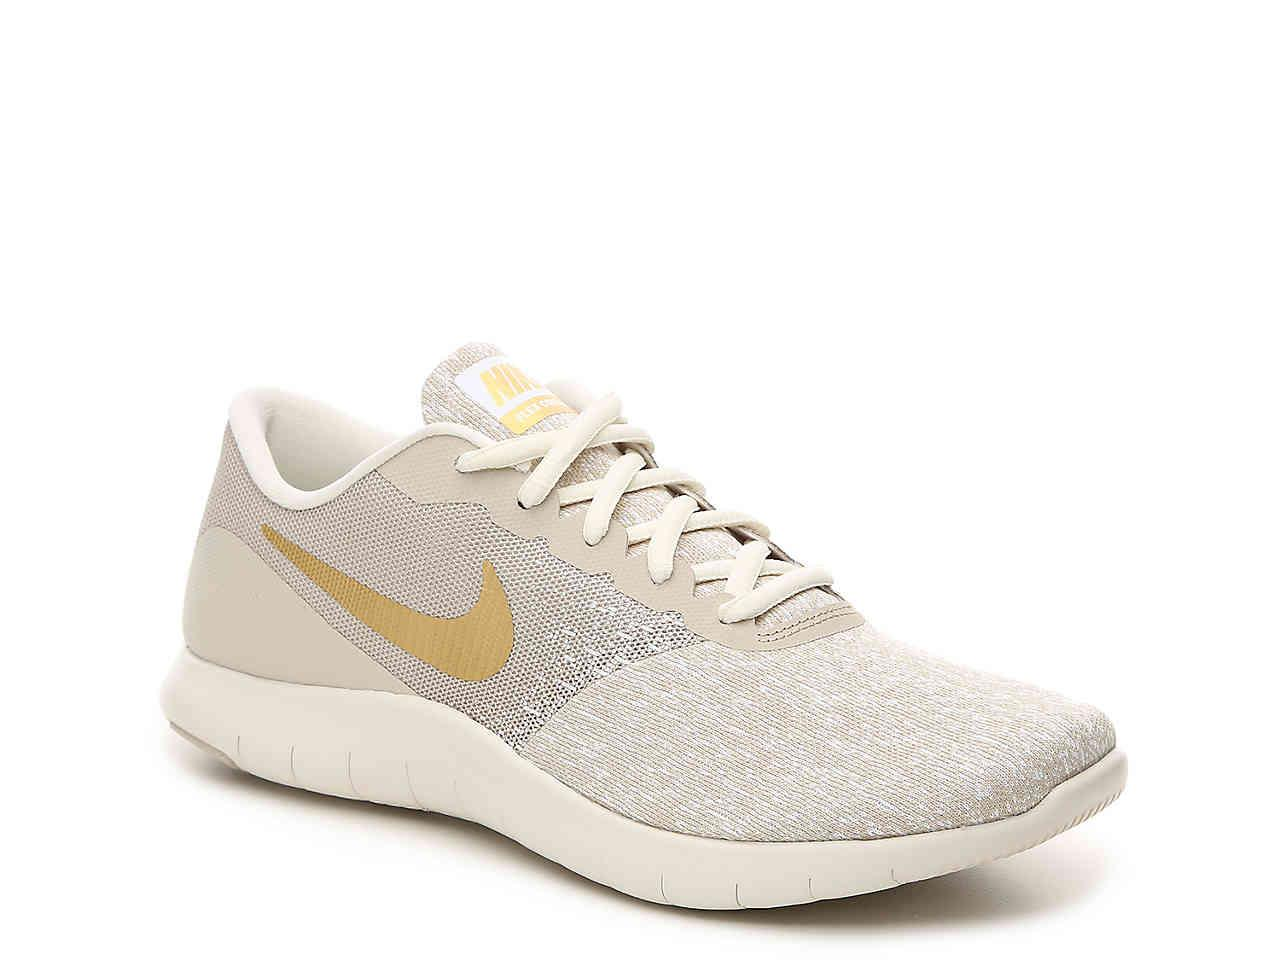 c5c581849065 Lyst - Nike Flex Contact Lightweight Running Shoe in White